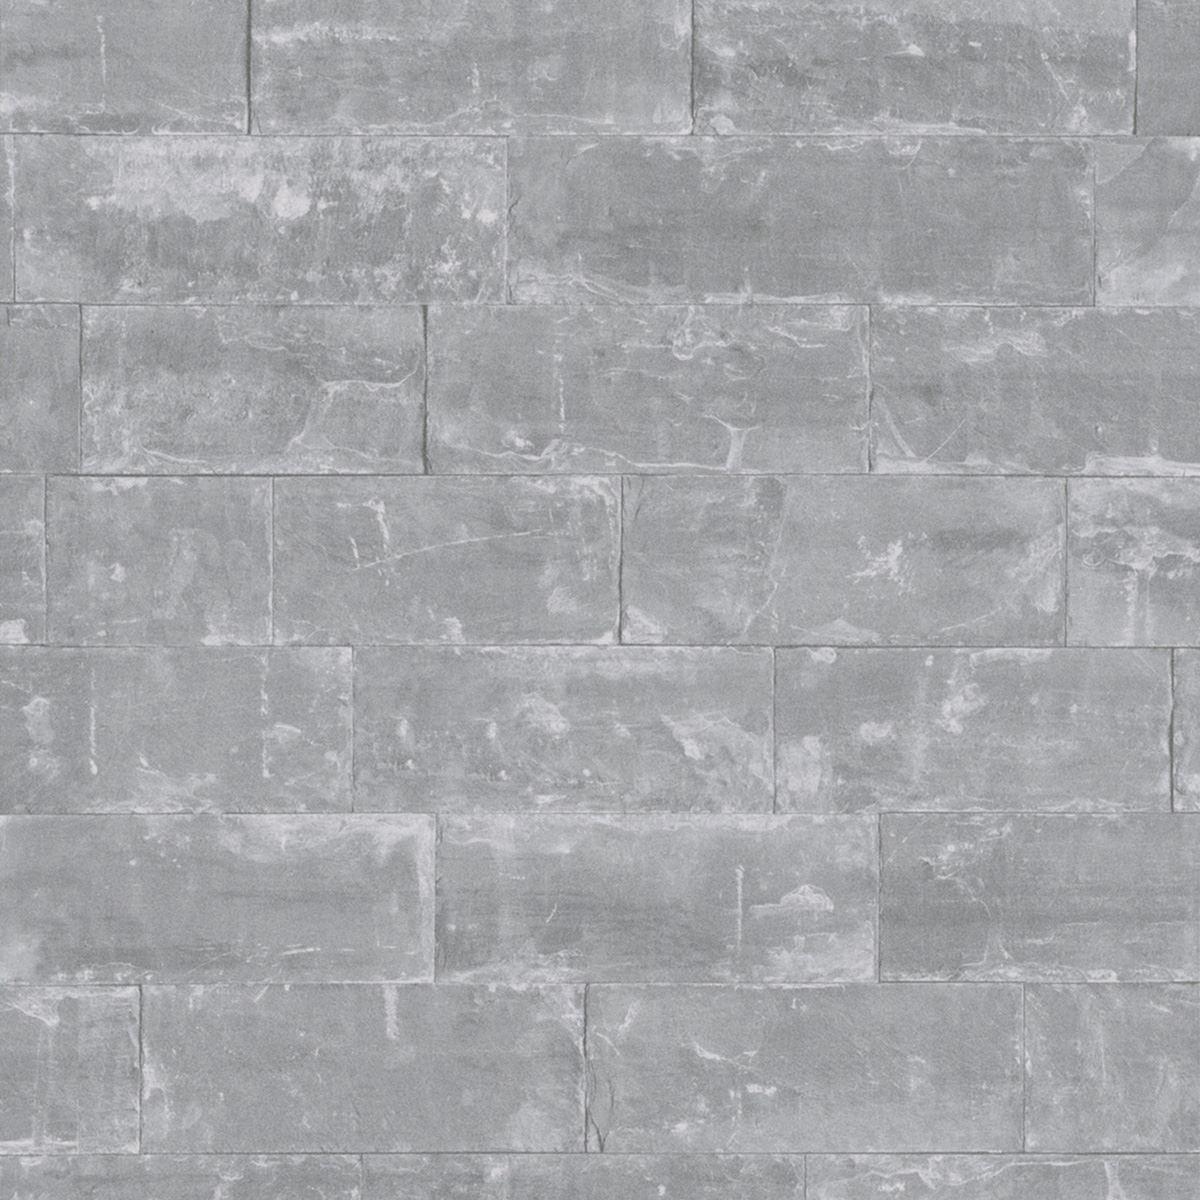 RASCH & FINE DECOR 10M LUXURY BRICK EFFECT WALLPAPER STONE ...